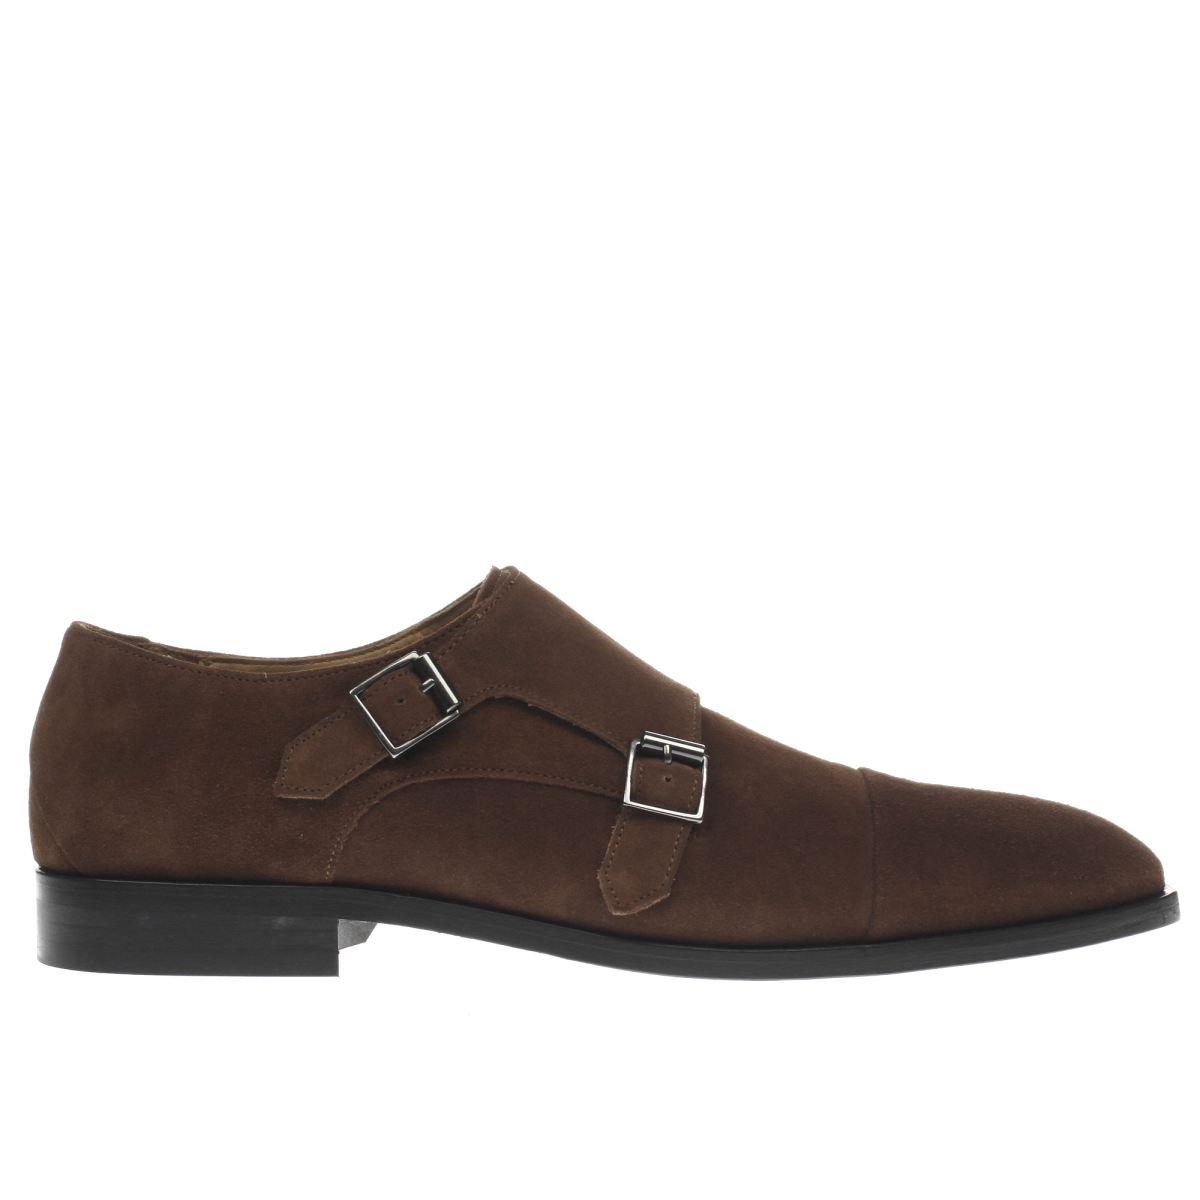 paul smith shoe ps Paul Smith Shoe Ps Brown Luigi Shoes